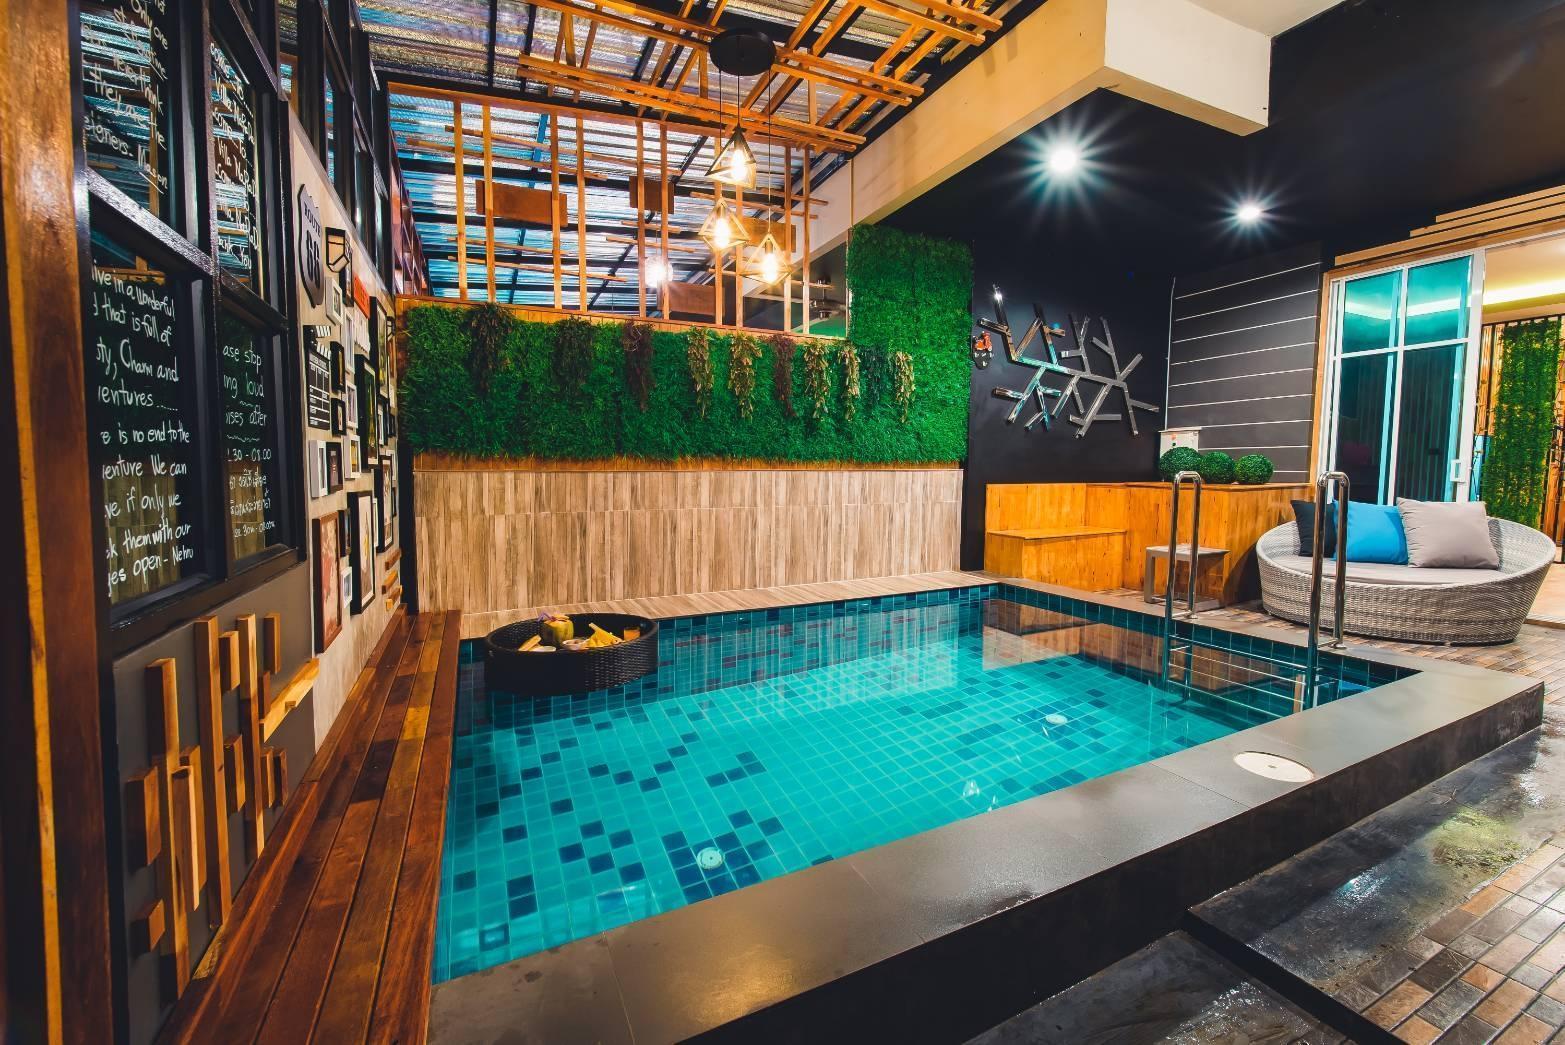 The Narada 2 bedrooms Private Pool villa krabi วิลลา 2 ห้องนอน 3 ห้องน้ำส่วนตัว ขนาด 200 ตร.ม. – กระบี่ น้อย